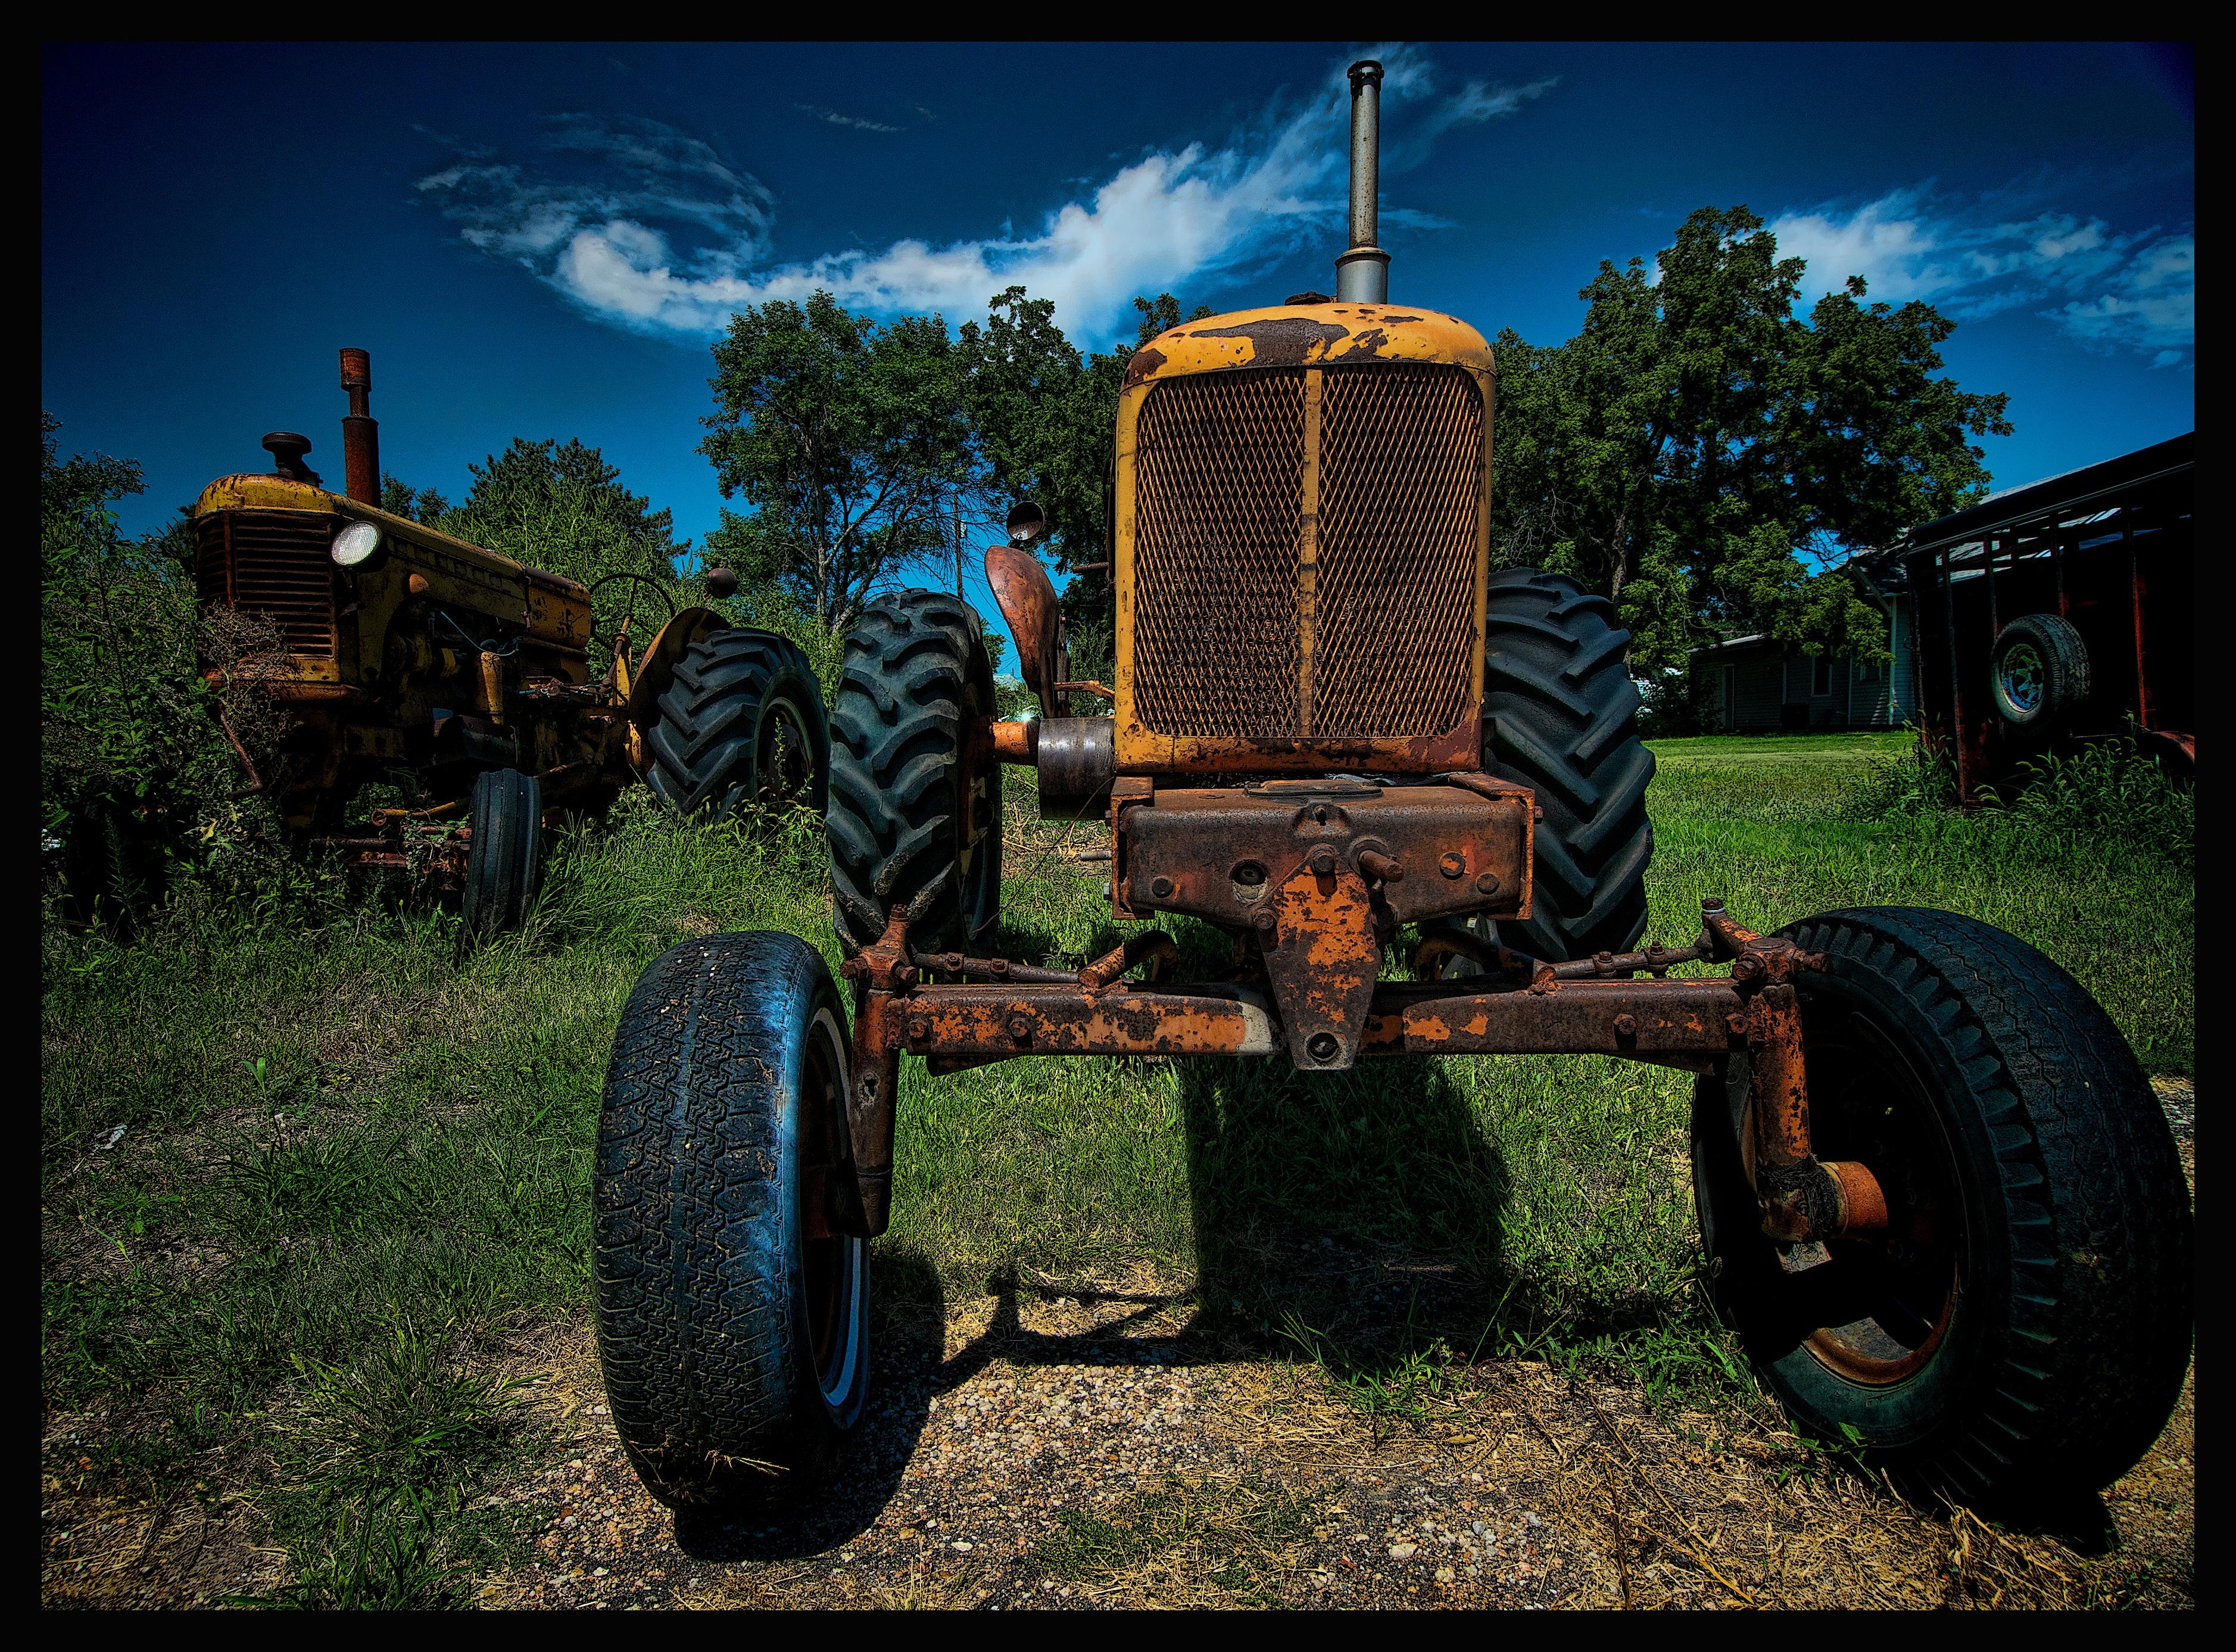 Kansas Tractors